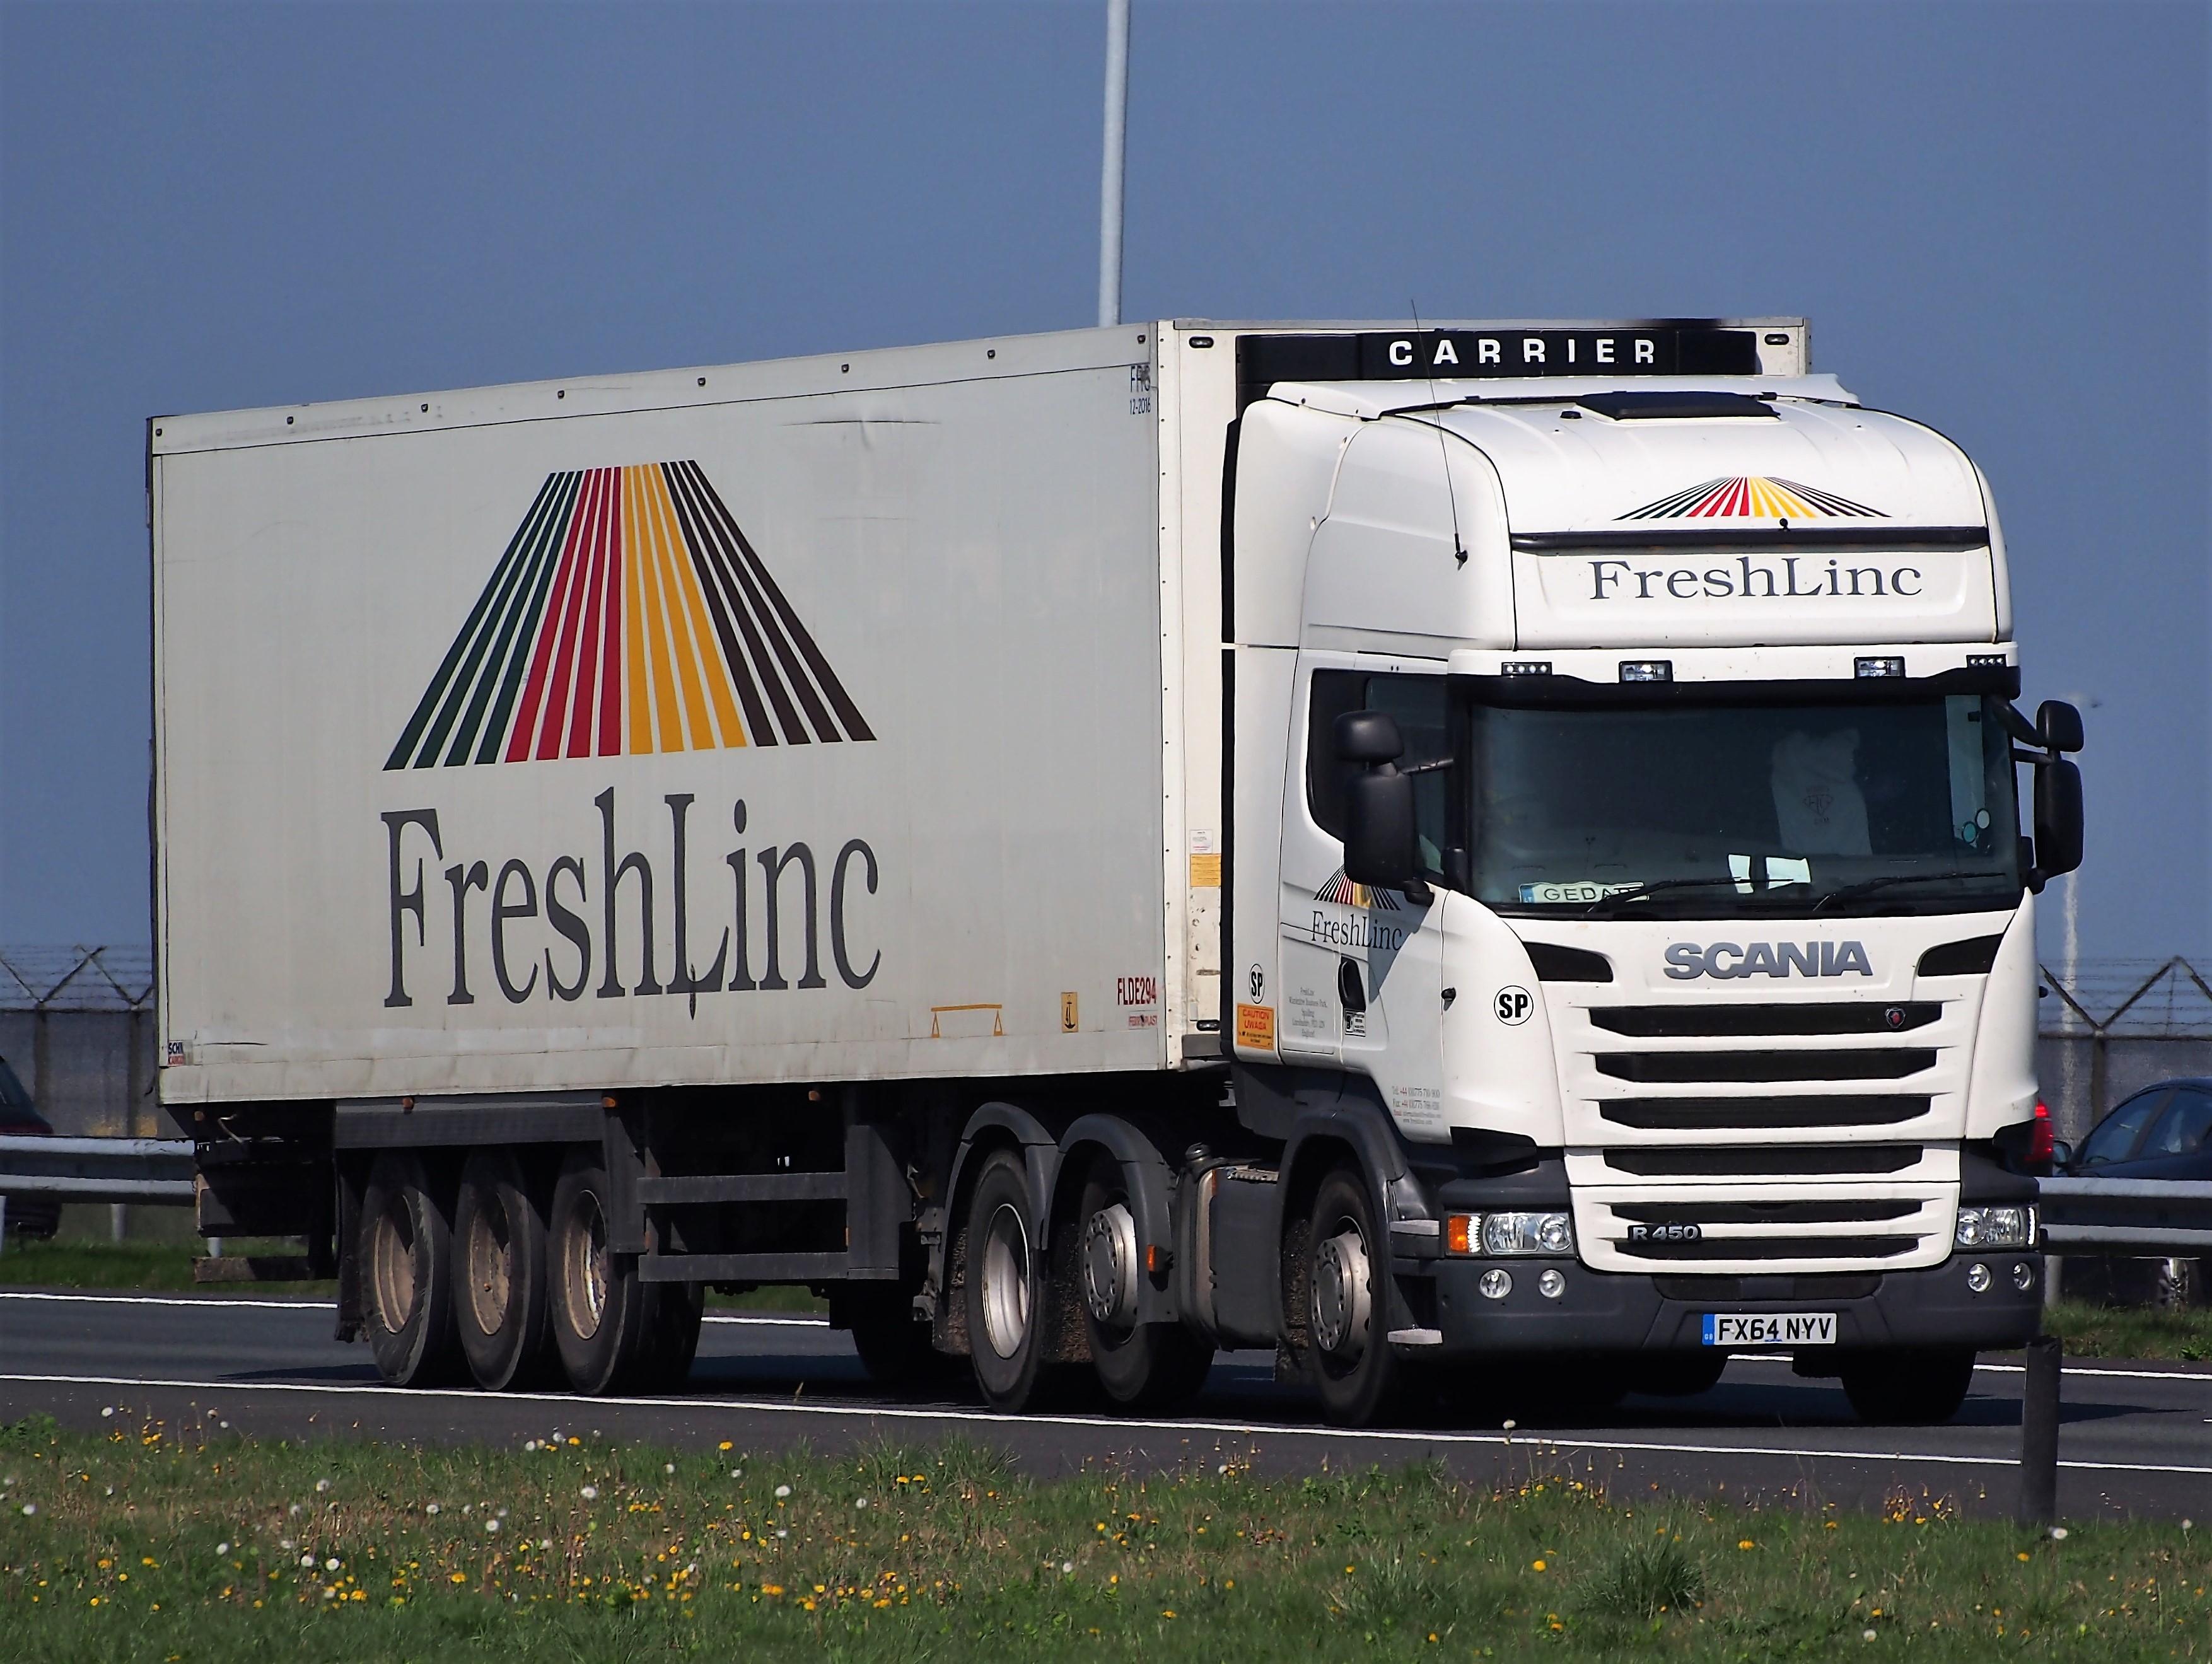 File:Scania truck R 450, FreshLinc.JPG - Wikimedia Commons